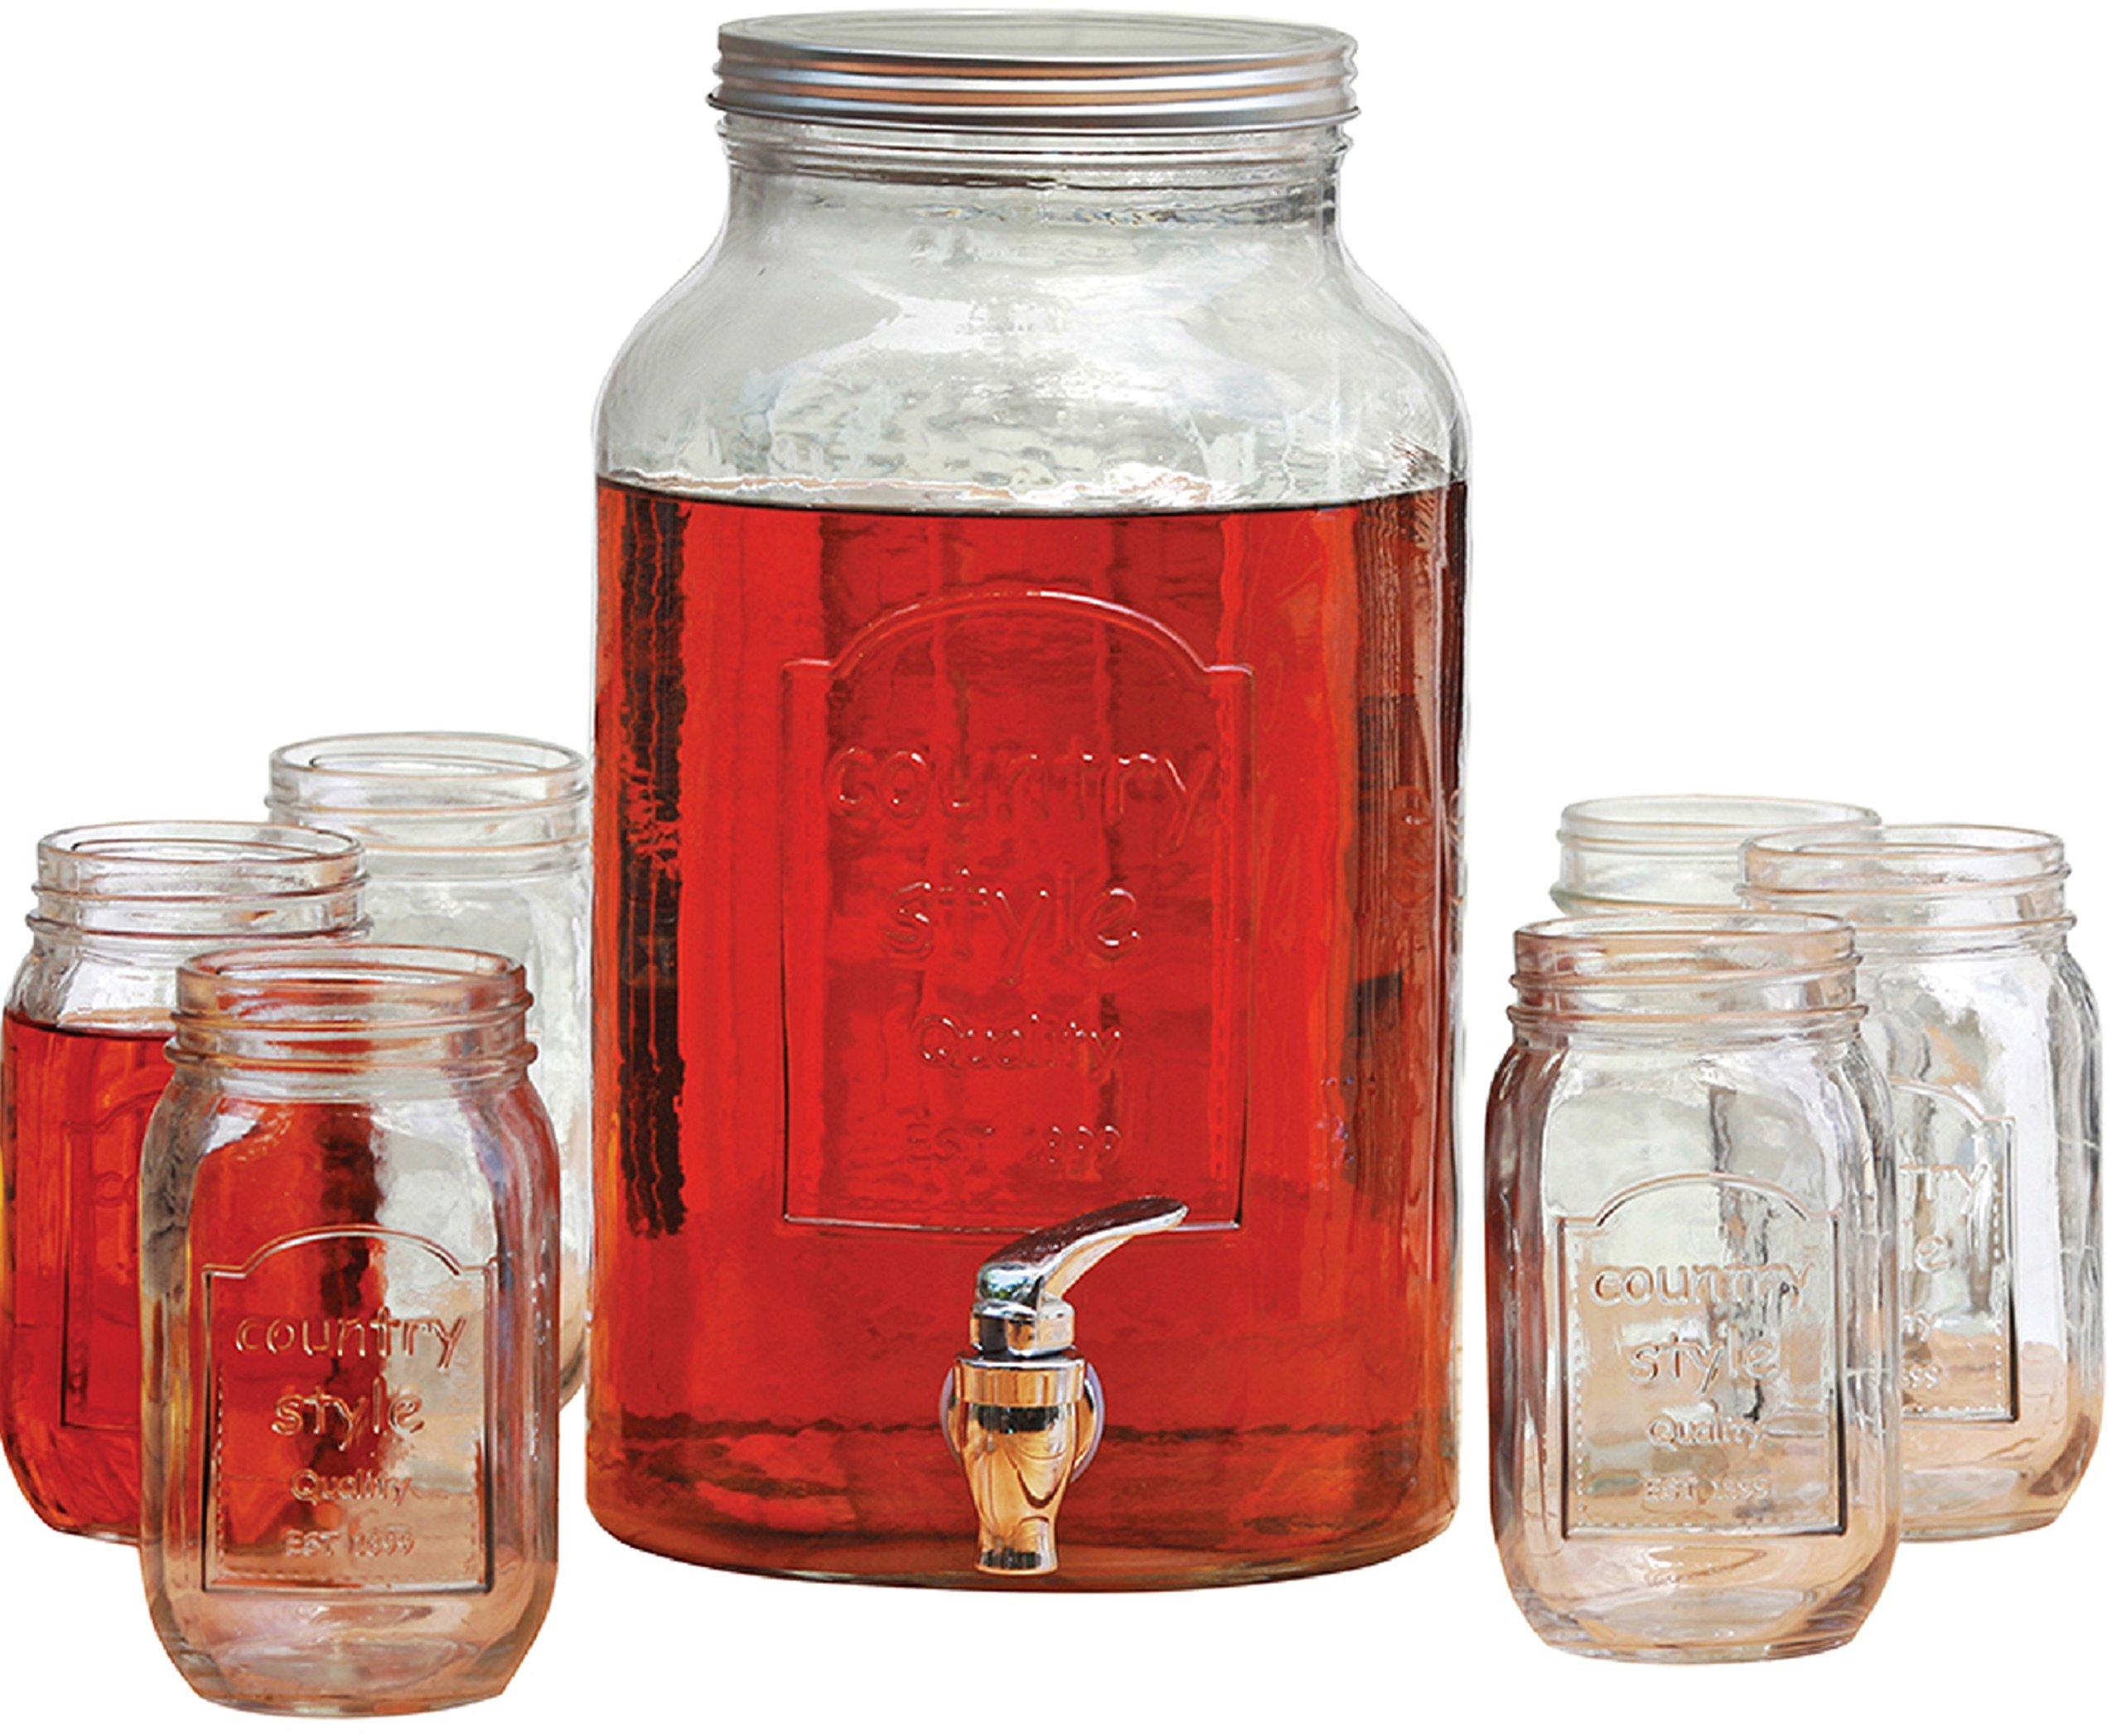 Circleware Country Glass Mason Jar Beverage Set, 1.5 Gallon Beverage Drink Dispenser, 6 Yorkshire Mason Jars, 16 Ounce Each, Gift Boxed